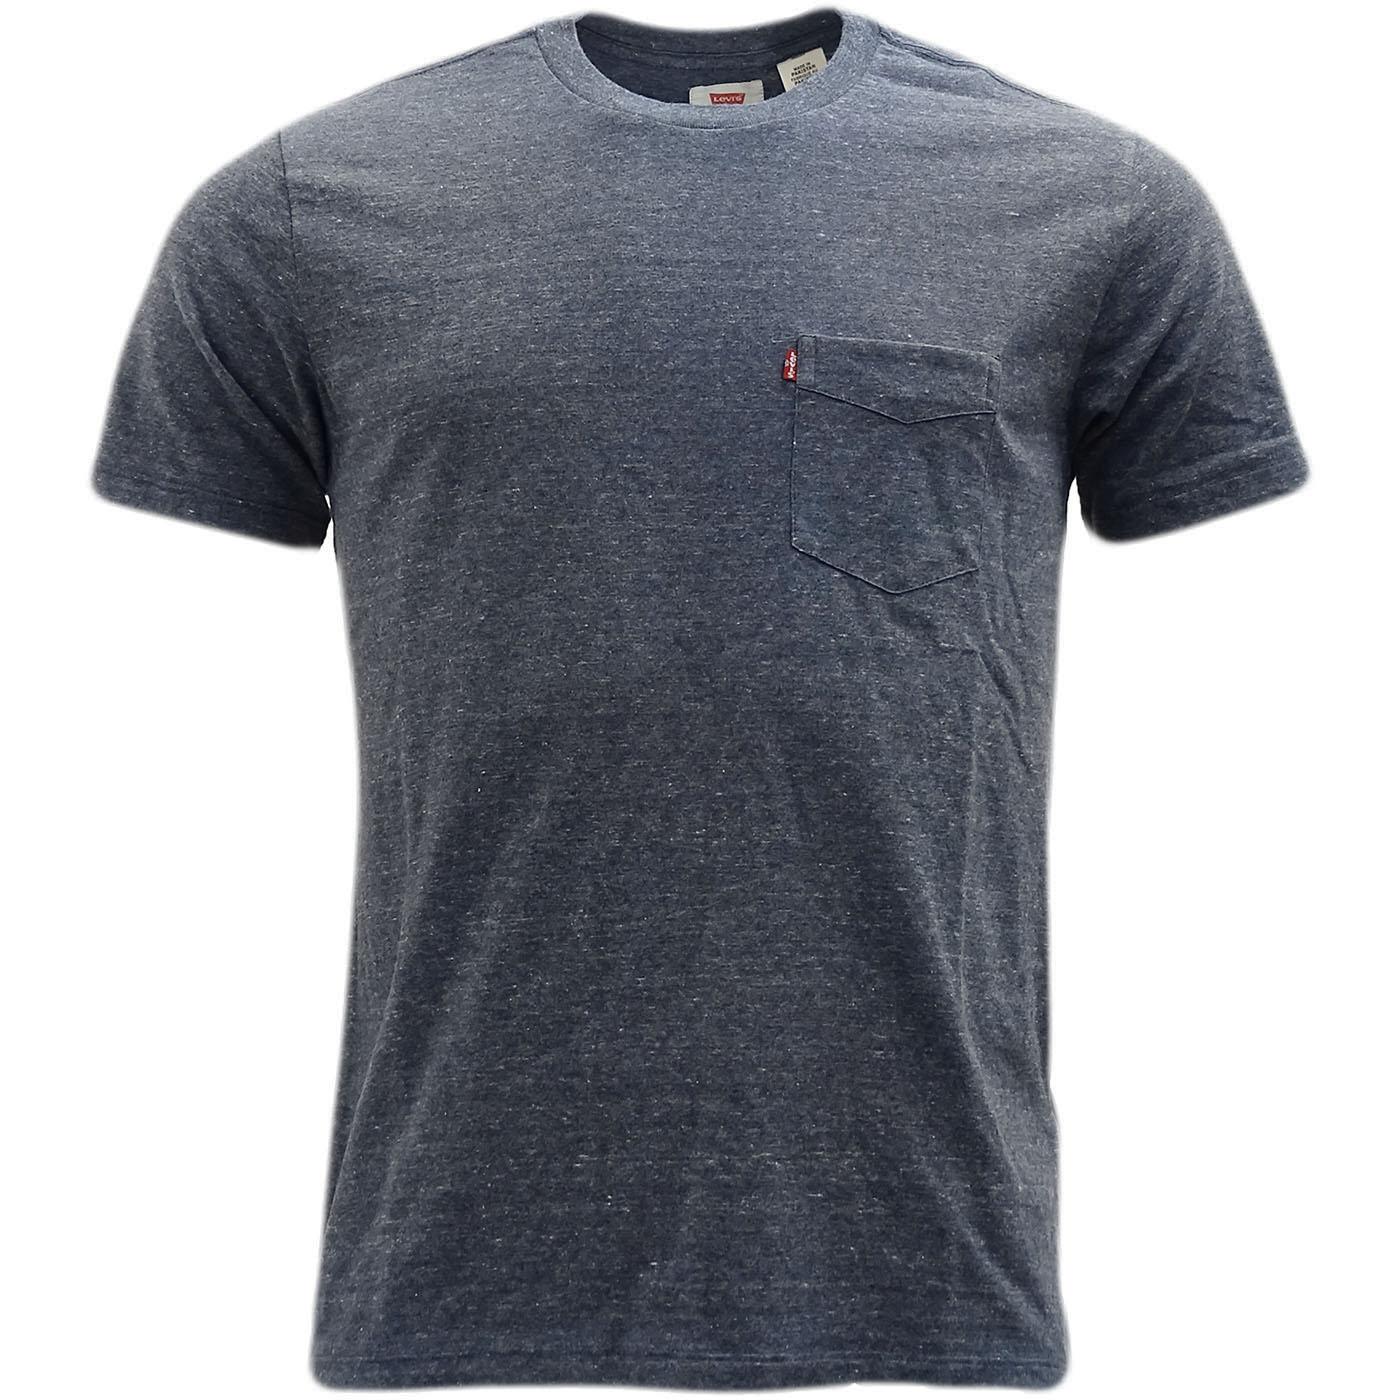 53b034c89cfd Levi Strauss Plain Sunset Pocket Tee   Levi S T-Shirt - 29813